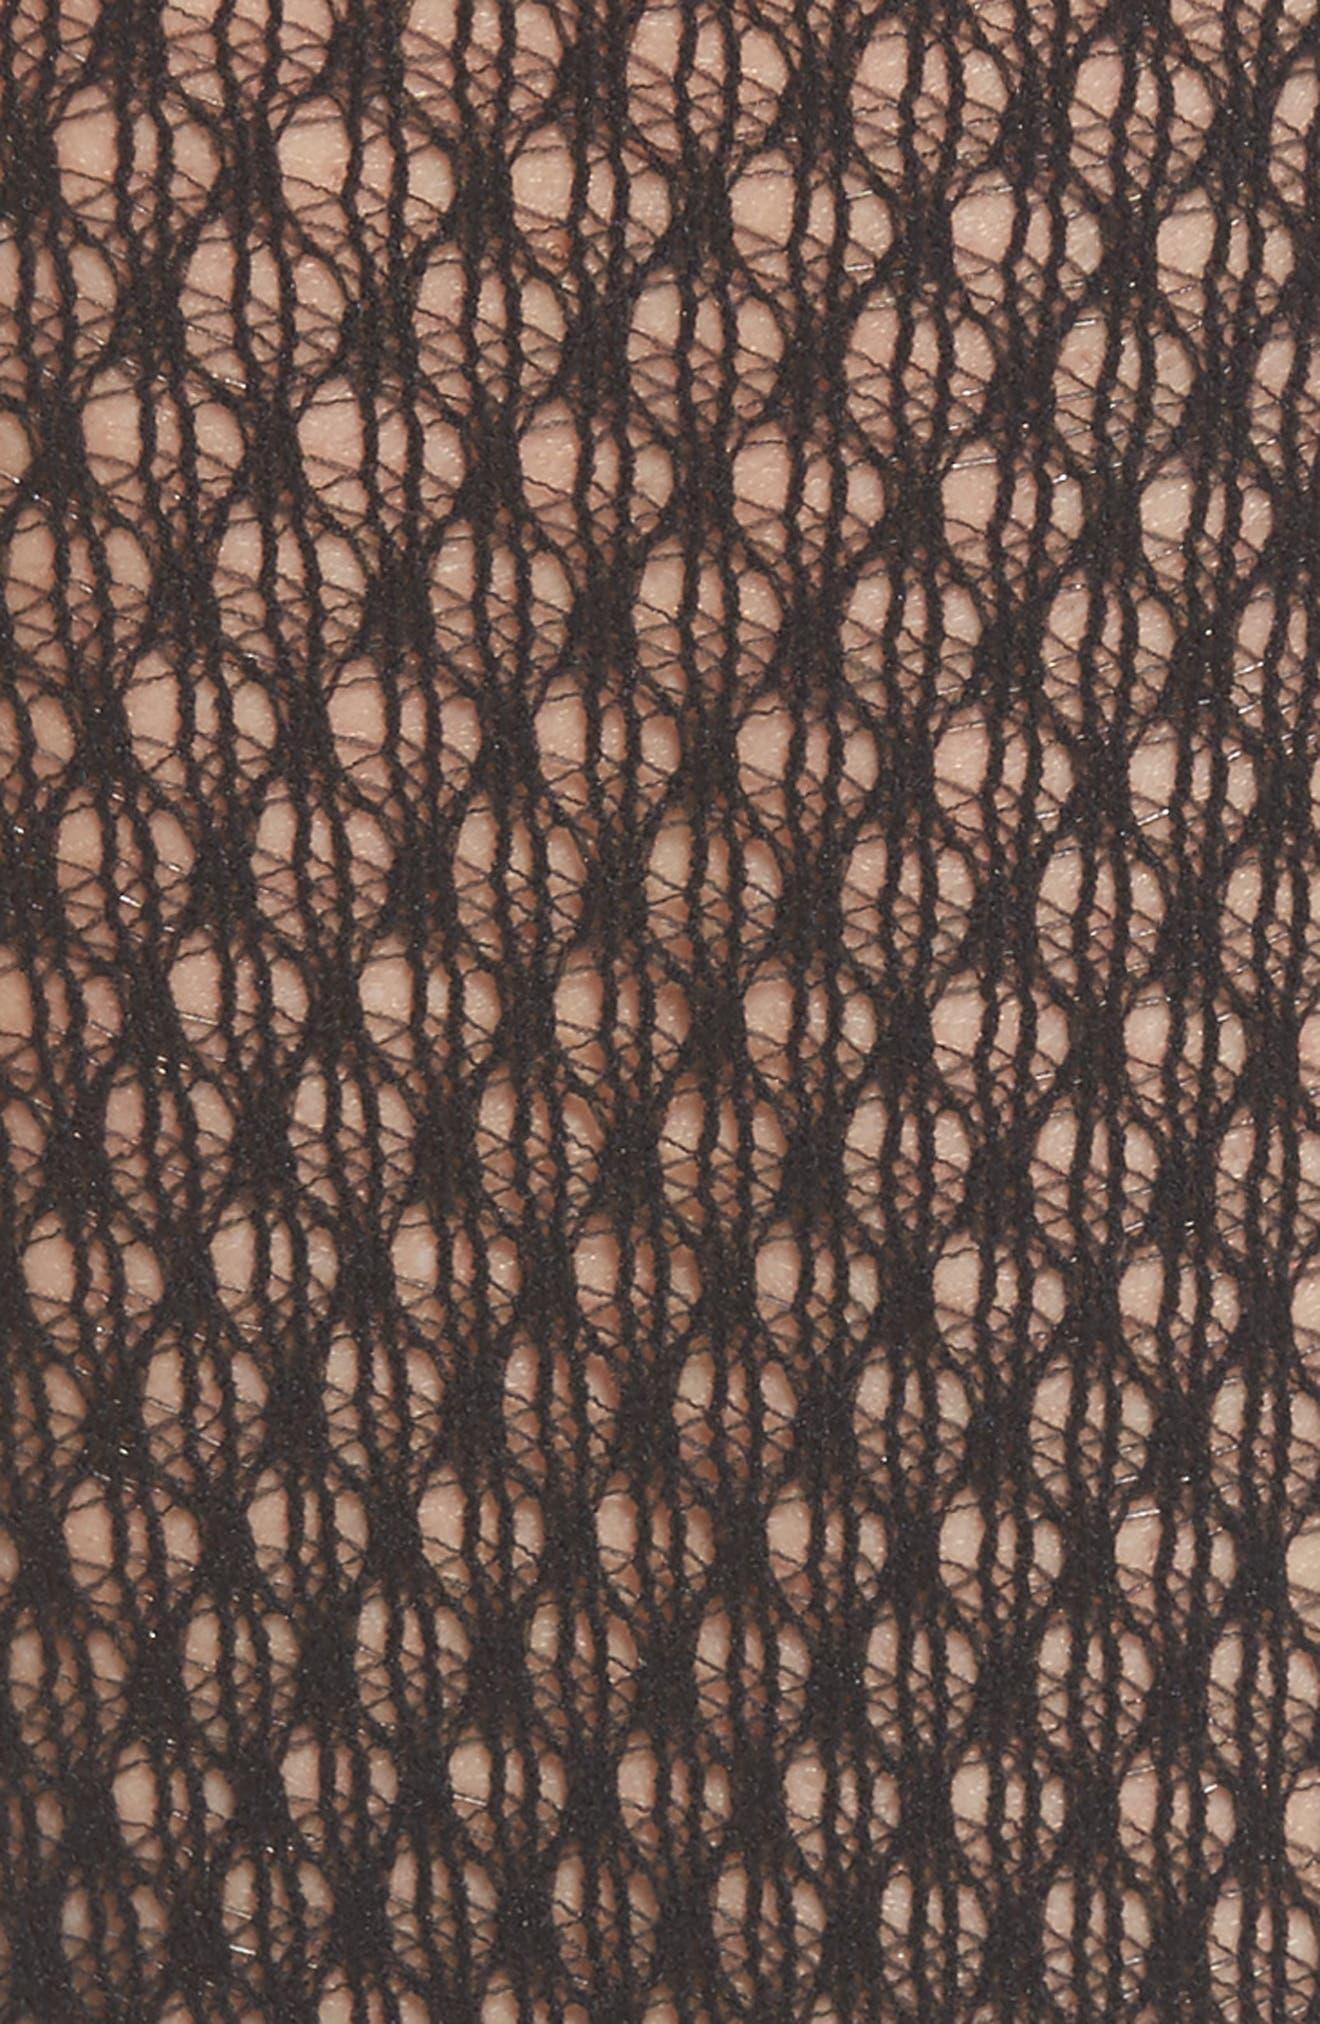 Rhomb Net Knee High Stockings,                             Alternate thumbnail 3, color,                             Black